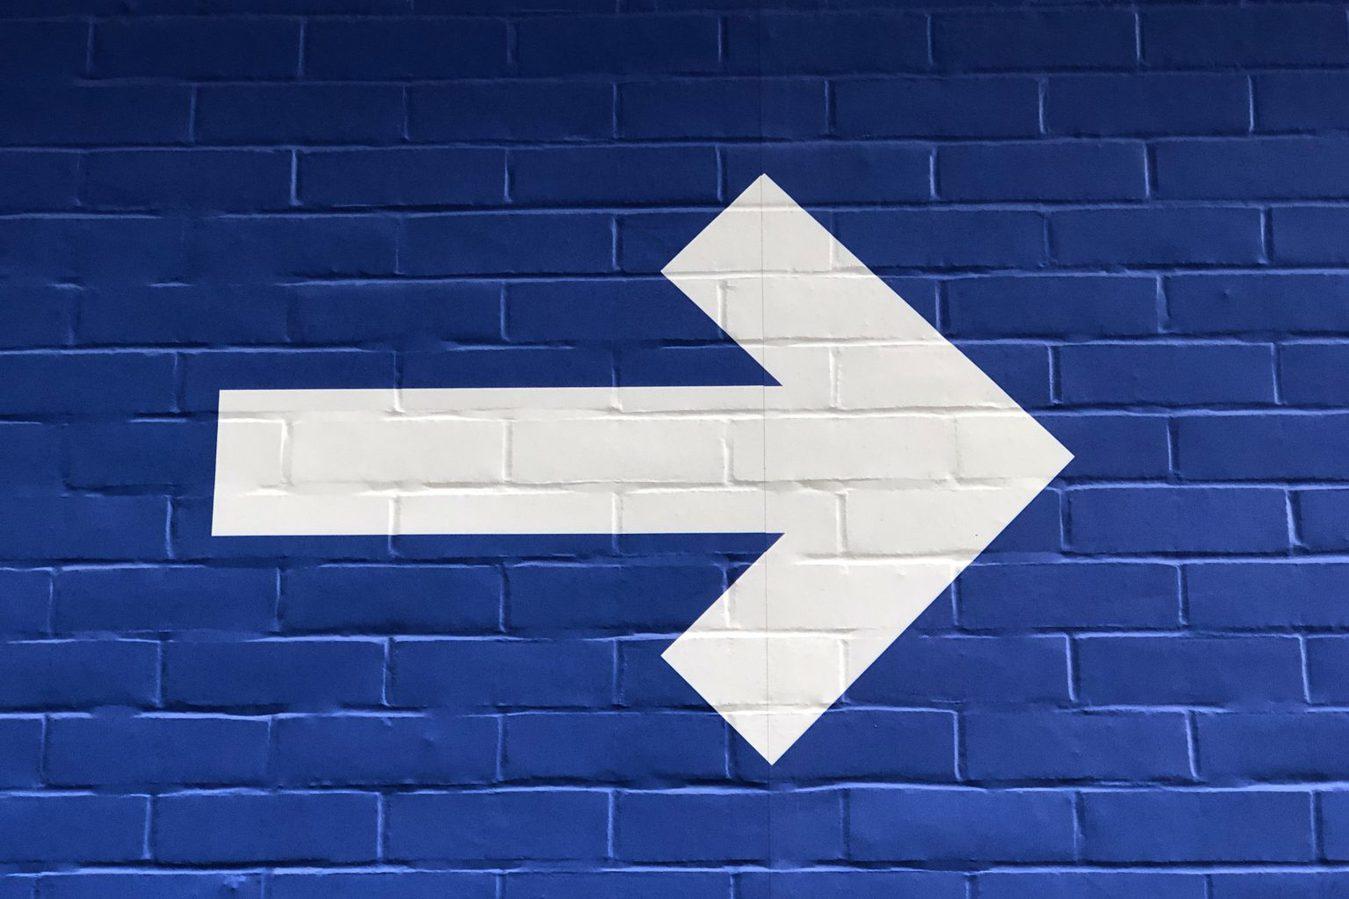 white-arrow-on-blue-background